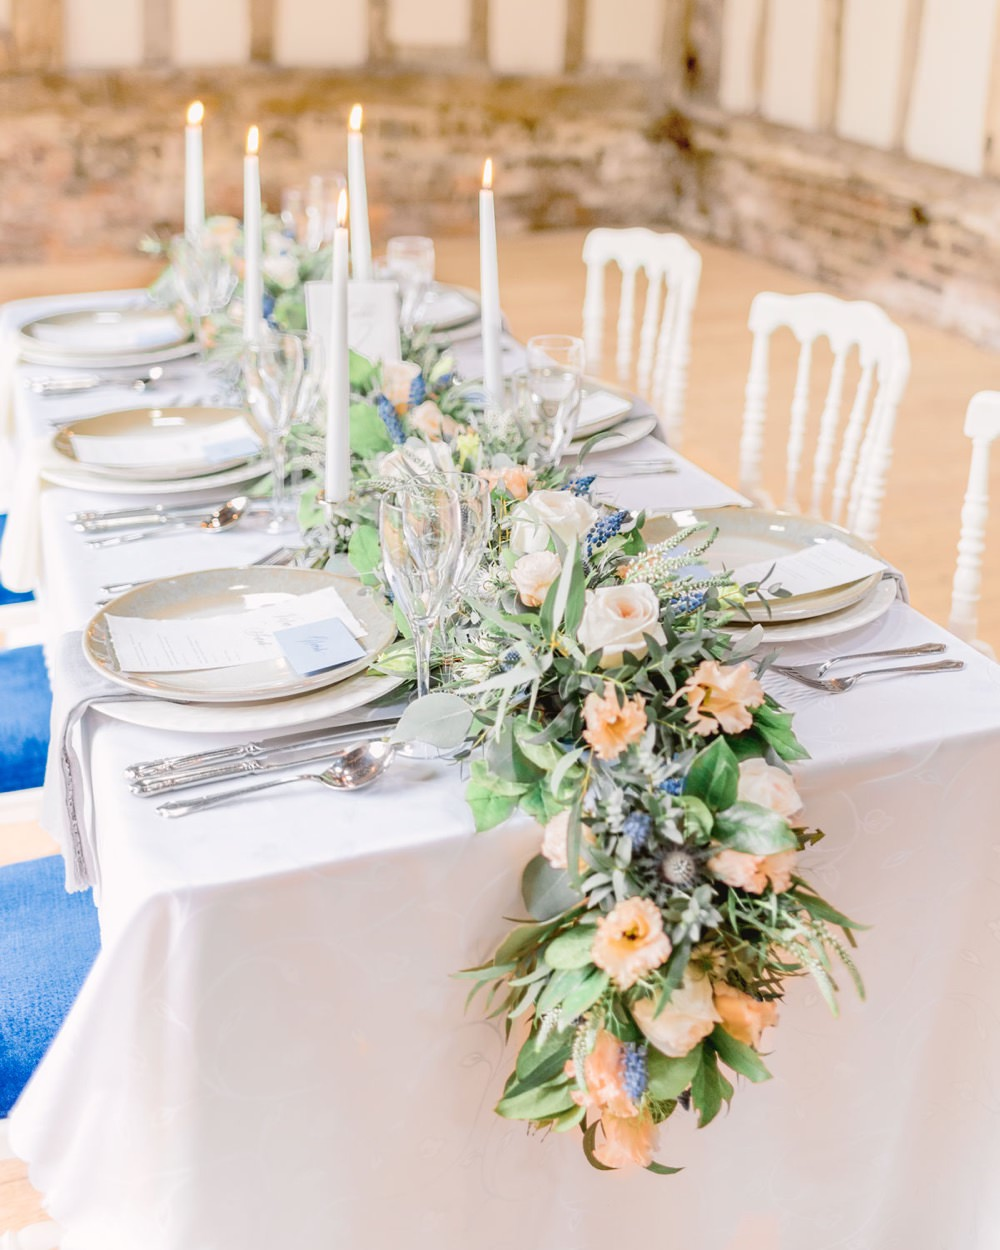 Tablescape Table Decor Decoration Peach Flowers Greenery Foliage Candles Runner Swag Elegant Wedding Ideas Yll Weddings